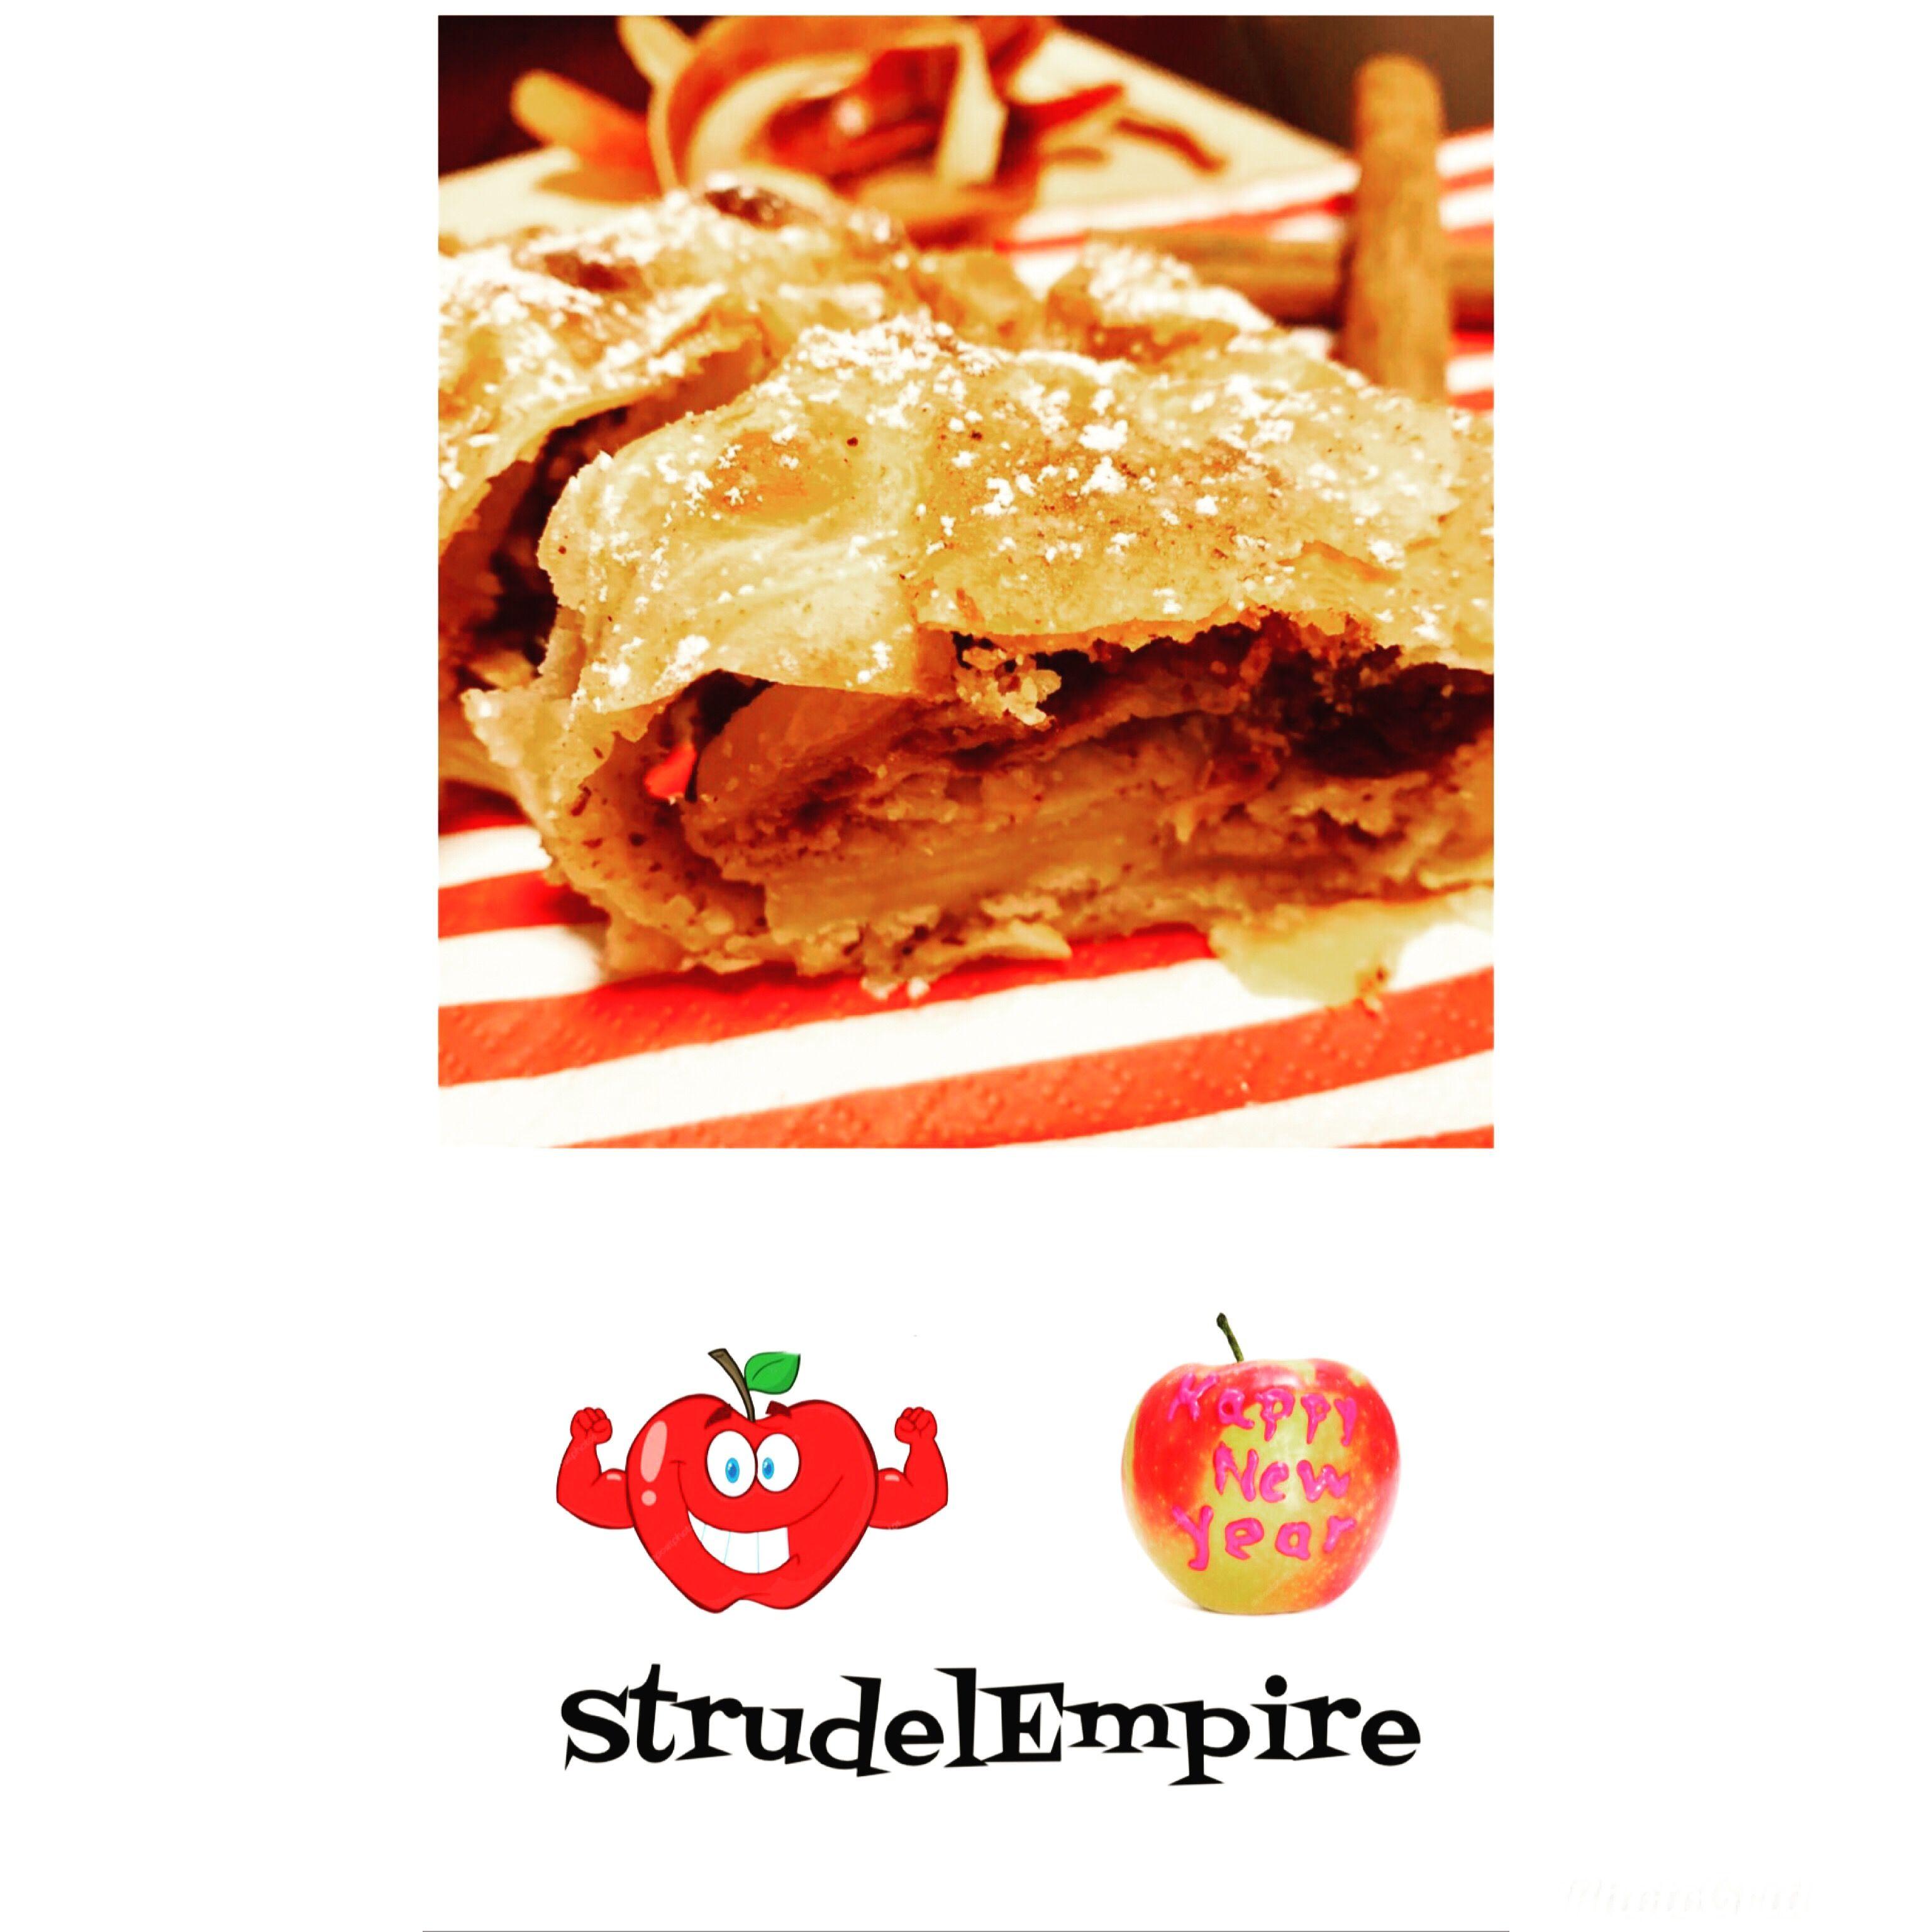 Apfelstrudel In 2020 Apfelstrudel Strudel Apfel